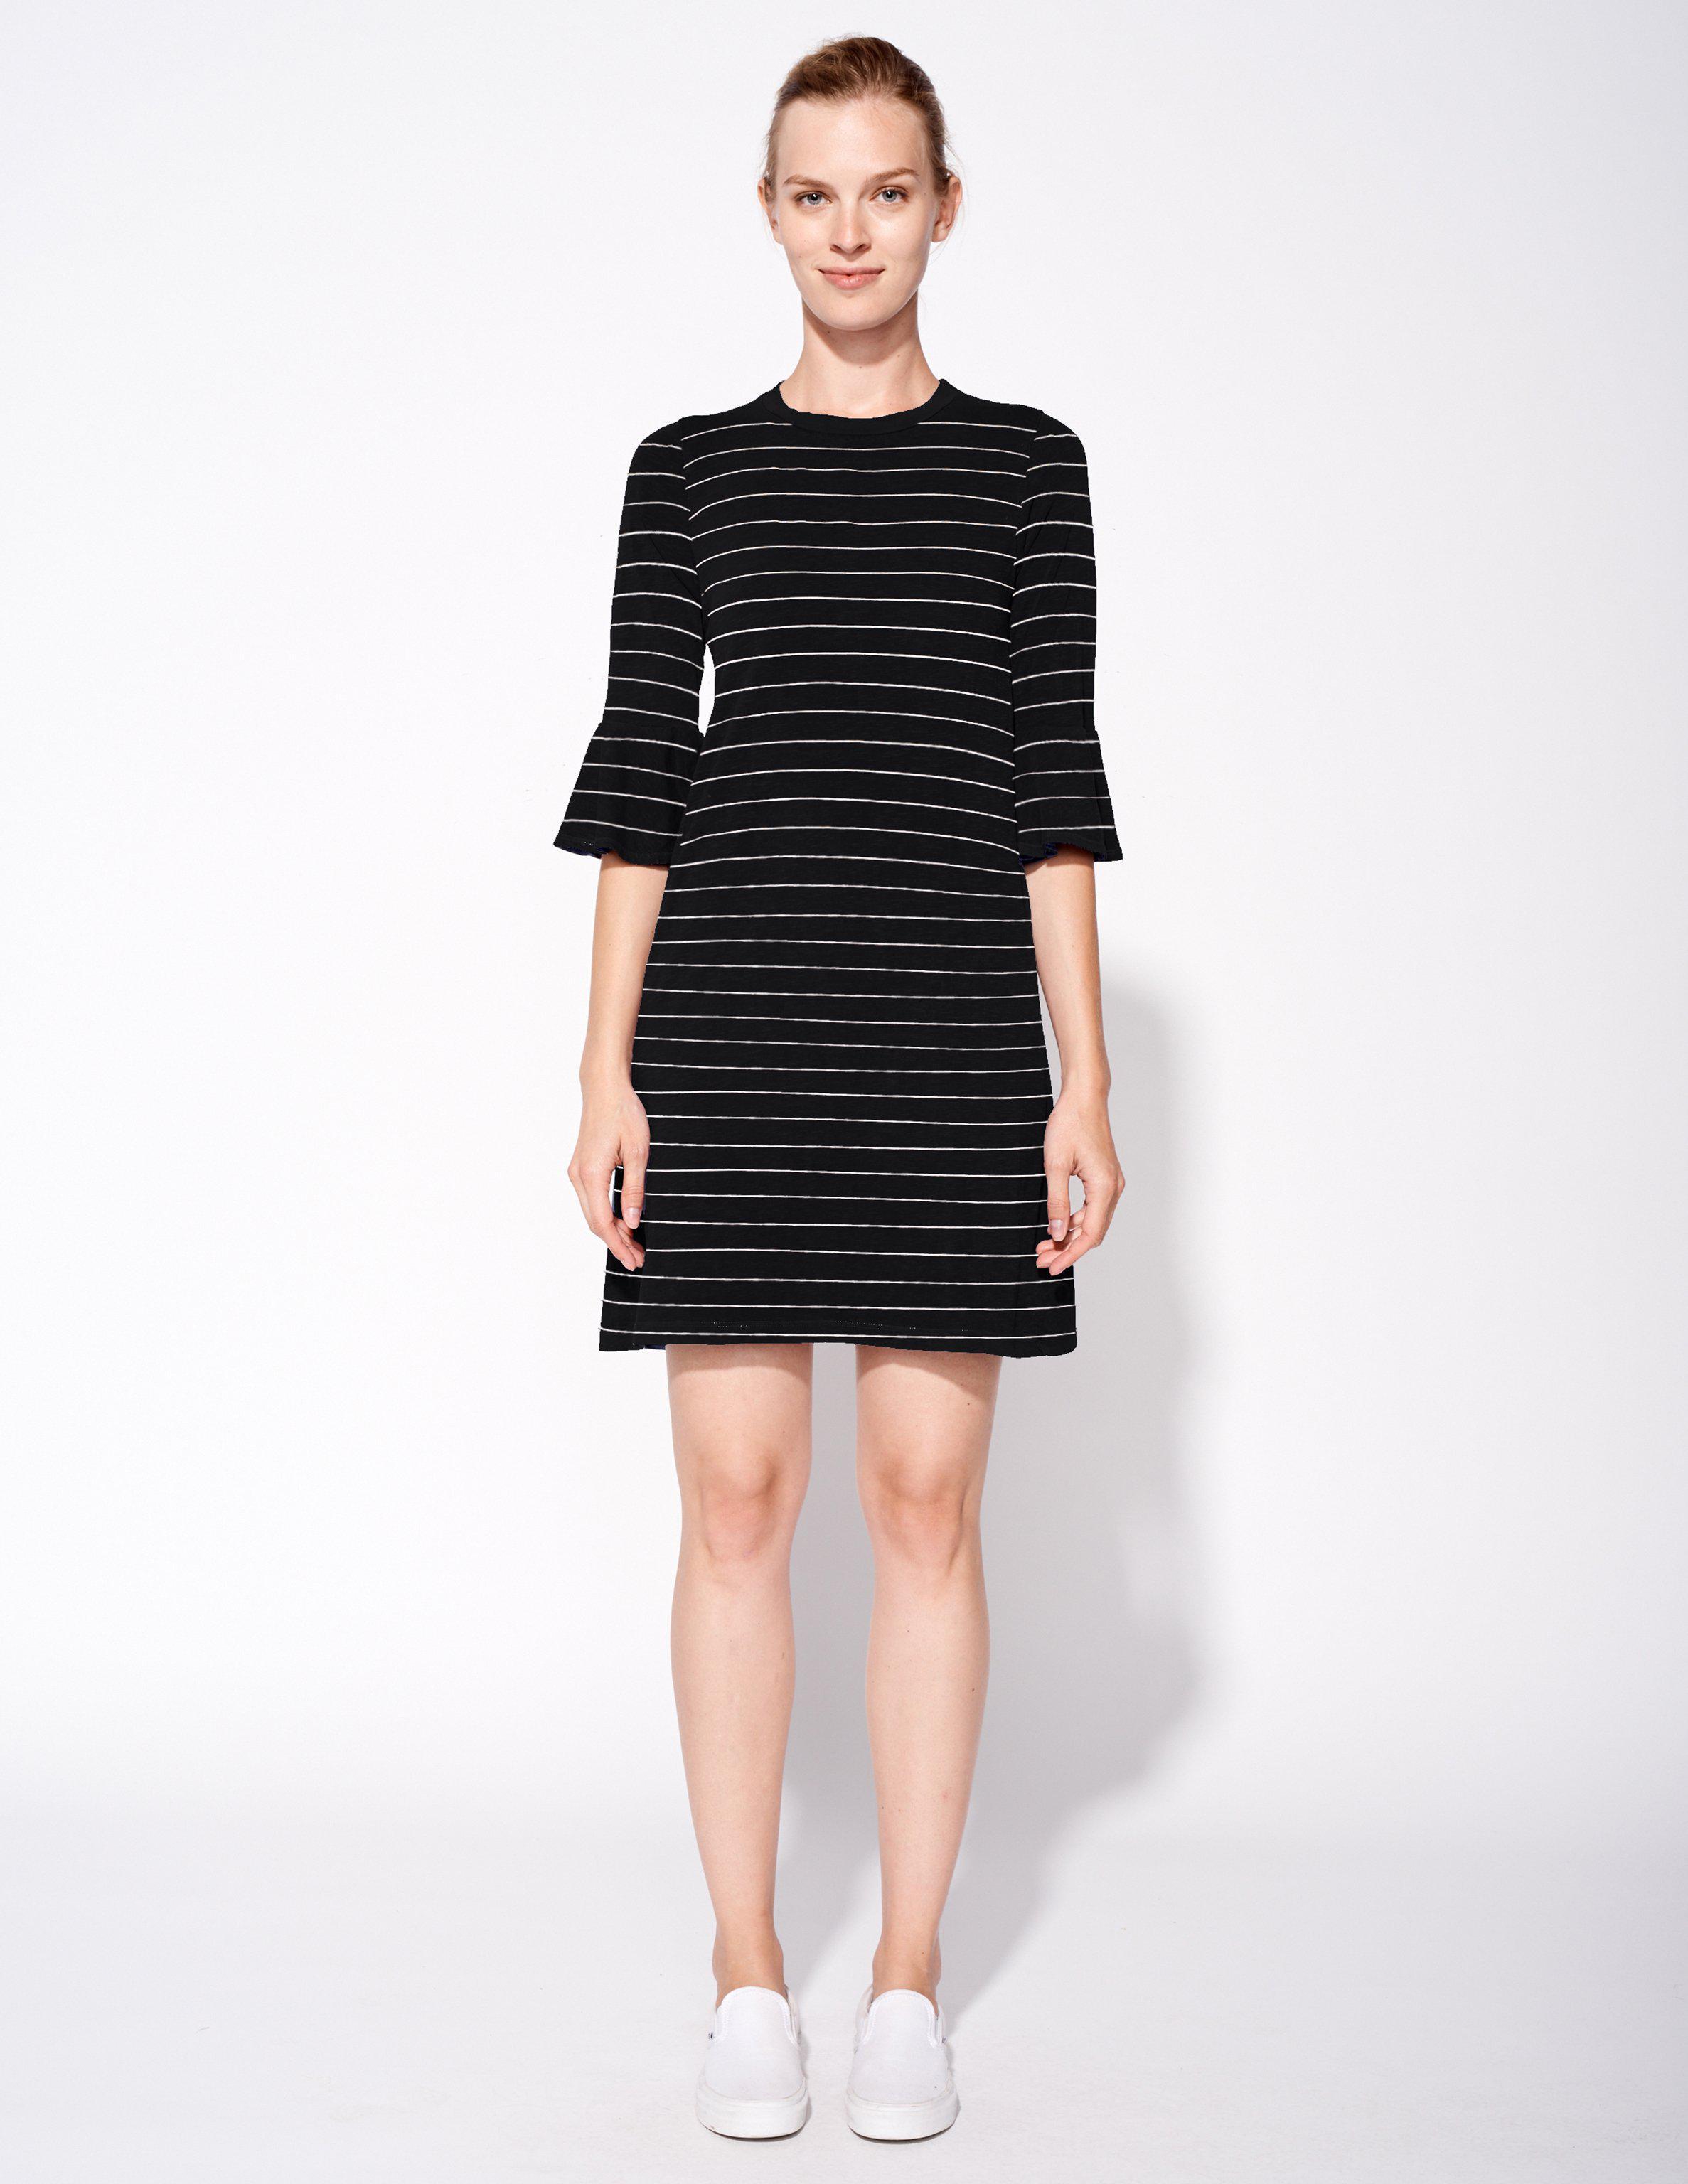 3190982ca1d94 Lyst - Sundry Stripes Ruffle Sleeve Dress in Black